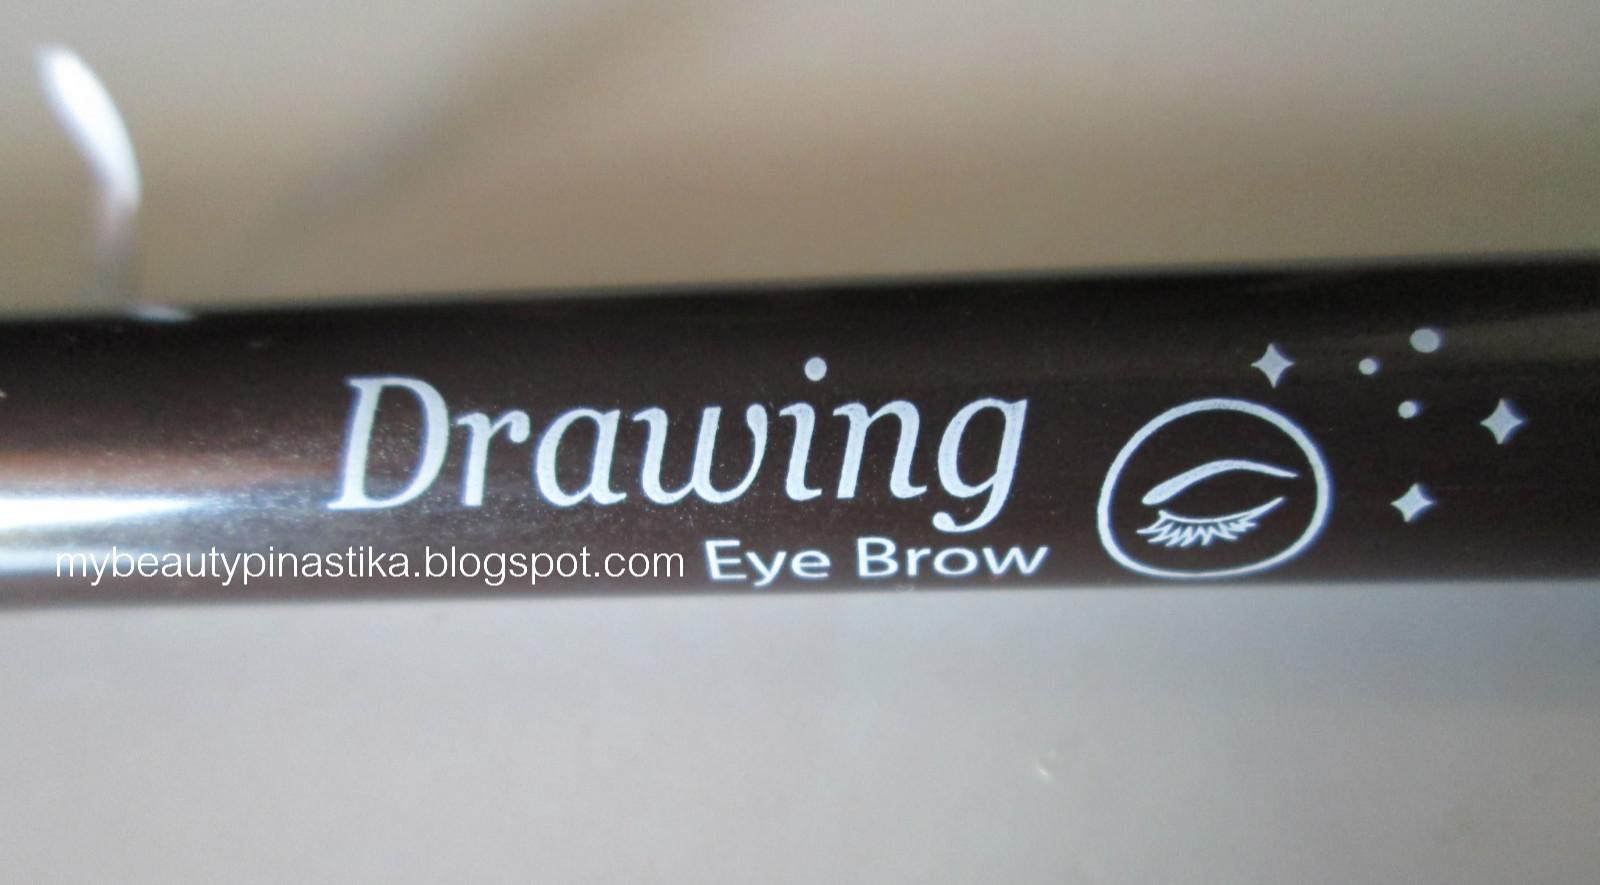 Pinastika Beauty Blog Etude House Drawing Eyebrow Ad 3 Brown Eye Brow Pensil Alis Packaging Ini Sangat Elegant Dan Minimalis Terdapat Dua Sisi Untuk Menggambar Brush Multifungsi Mudah Digunakan